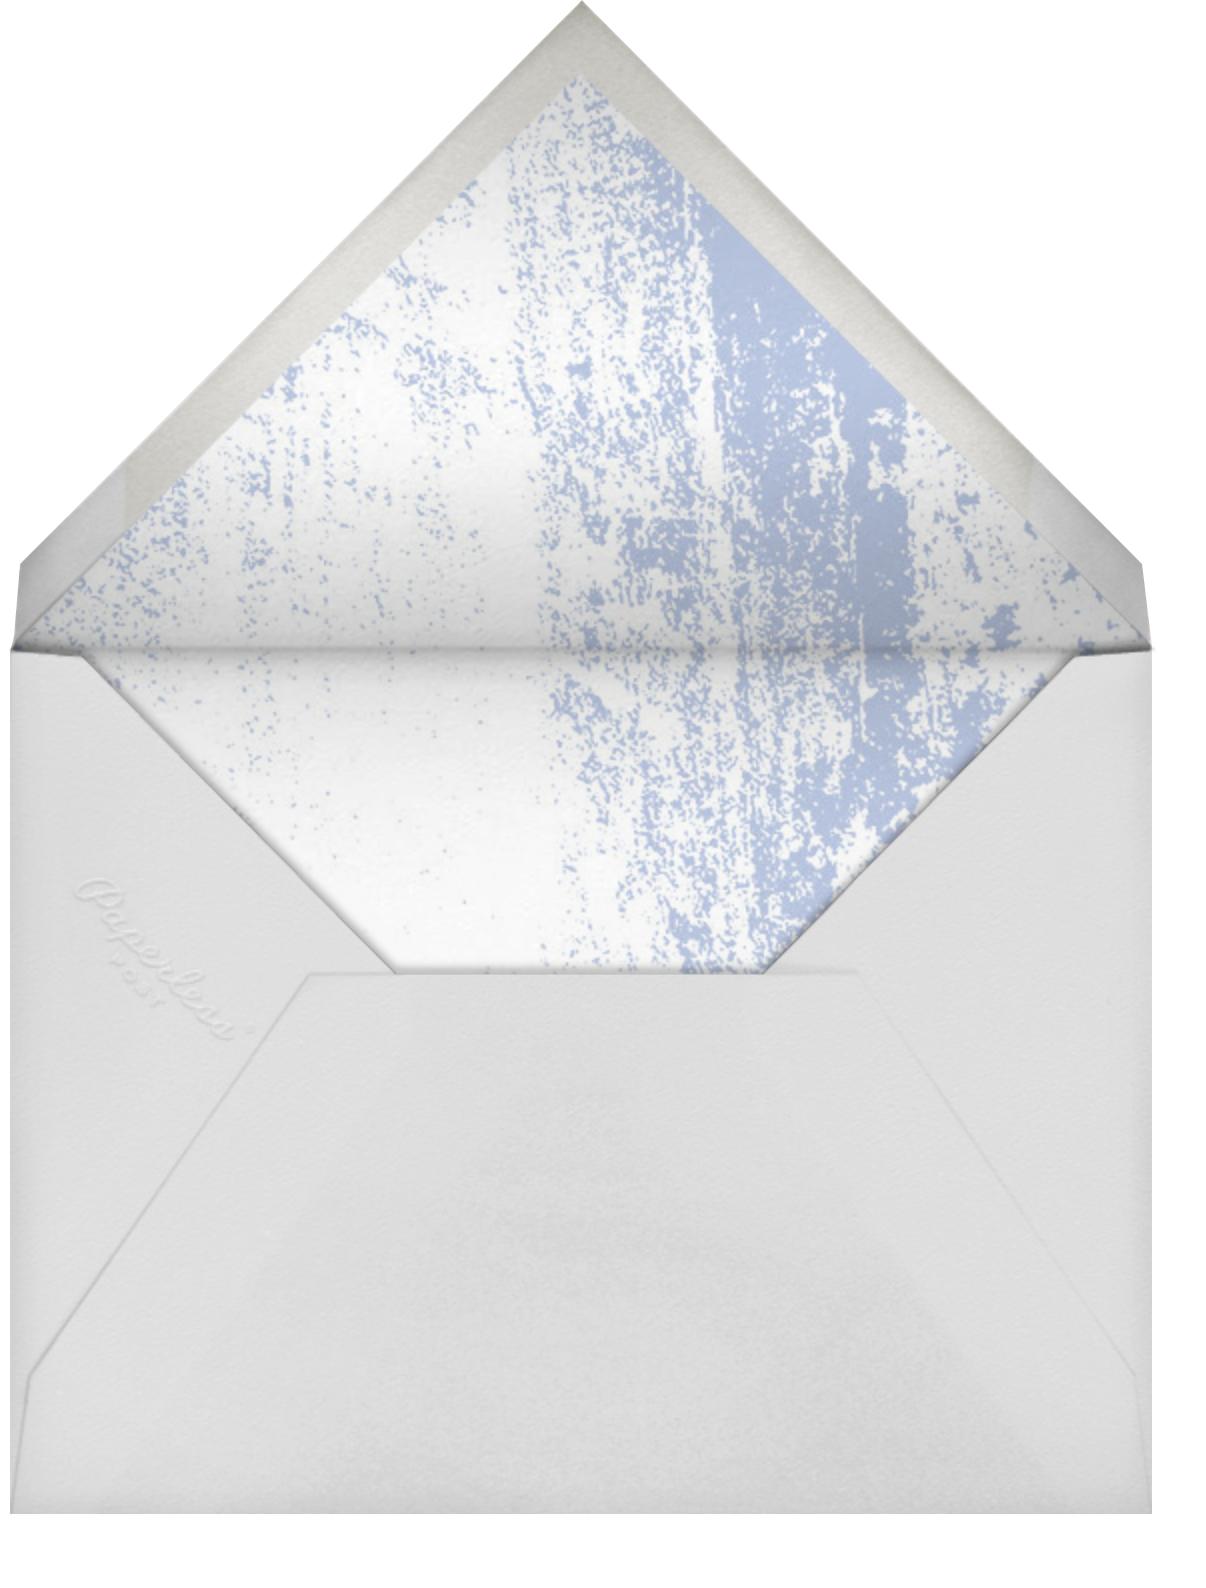 Coupling - Black - Kelly Wearstler - Engagement party - envelope back